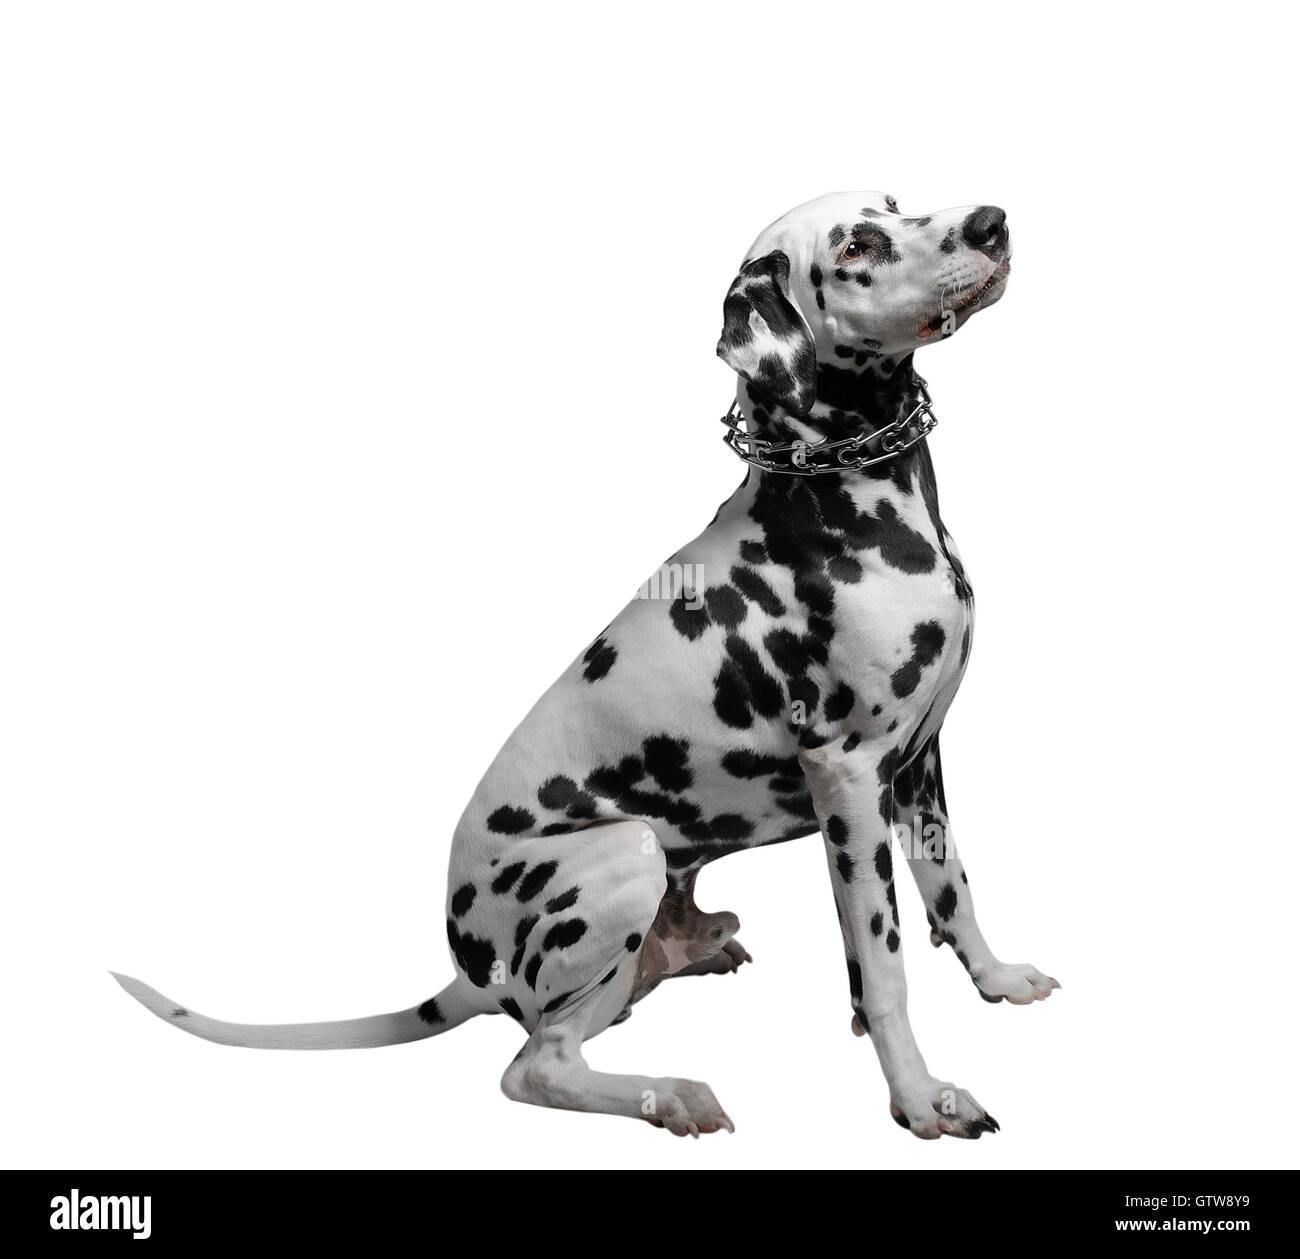 black and white dog sitting on a white background Dalmatian - Stock Image